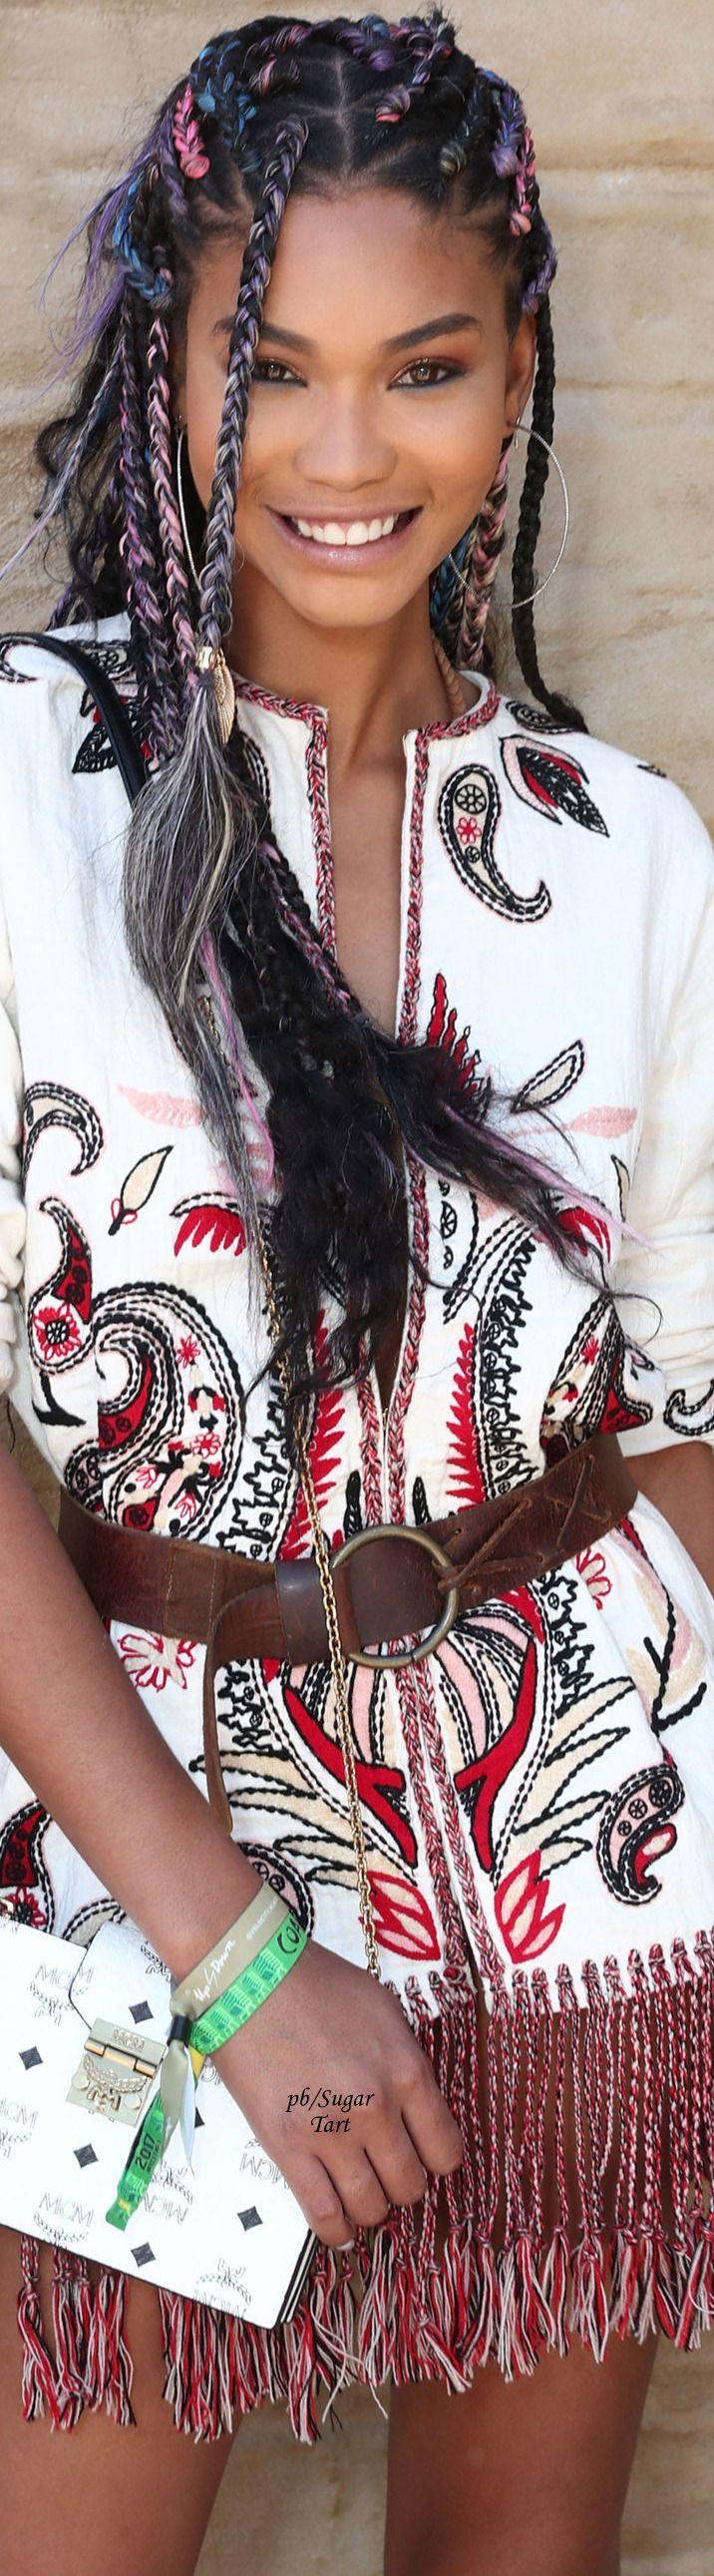 Chanel Iman - Coachella Style